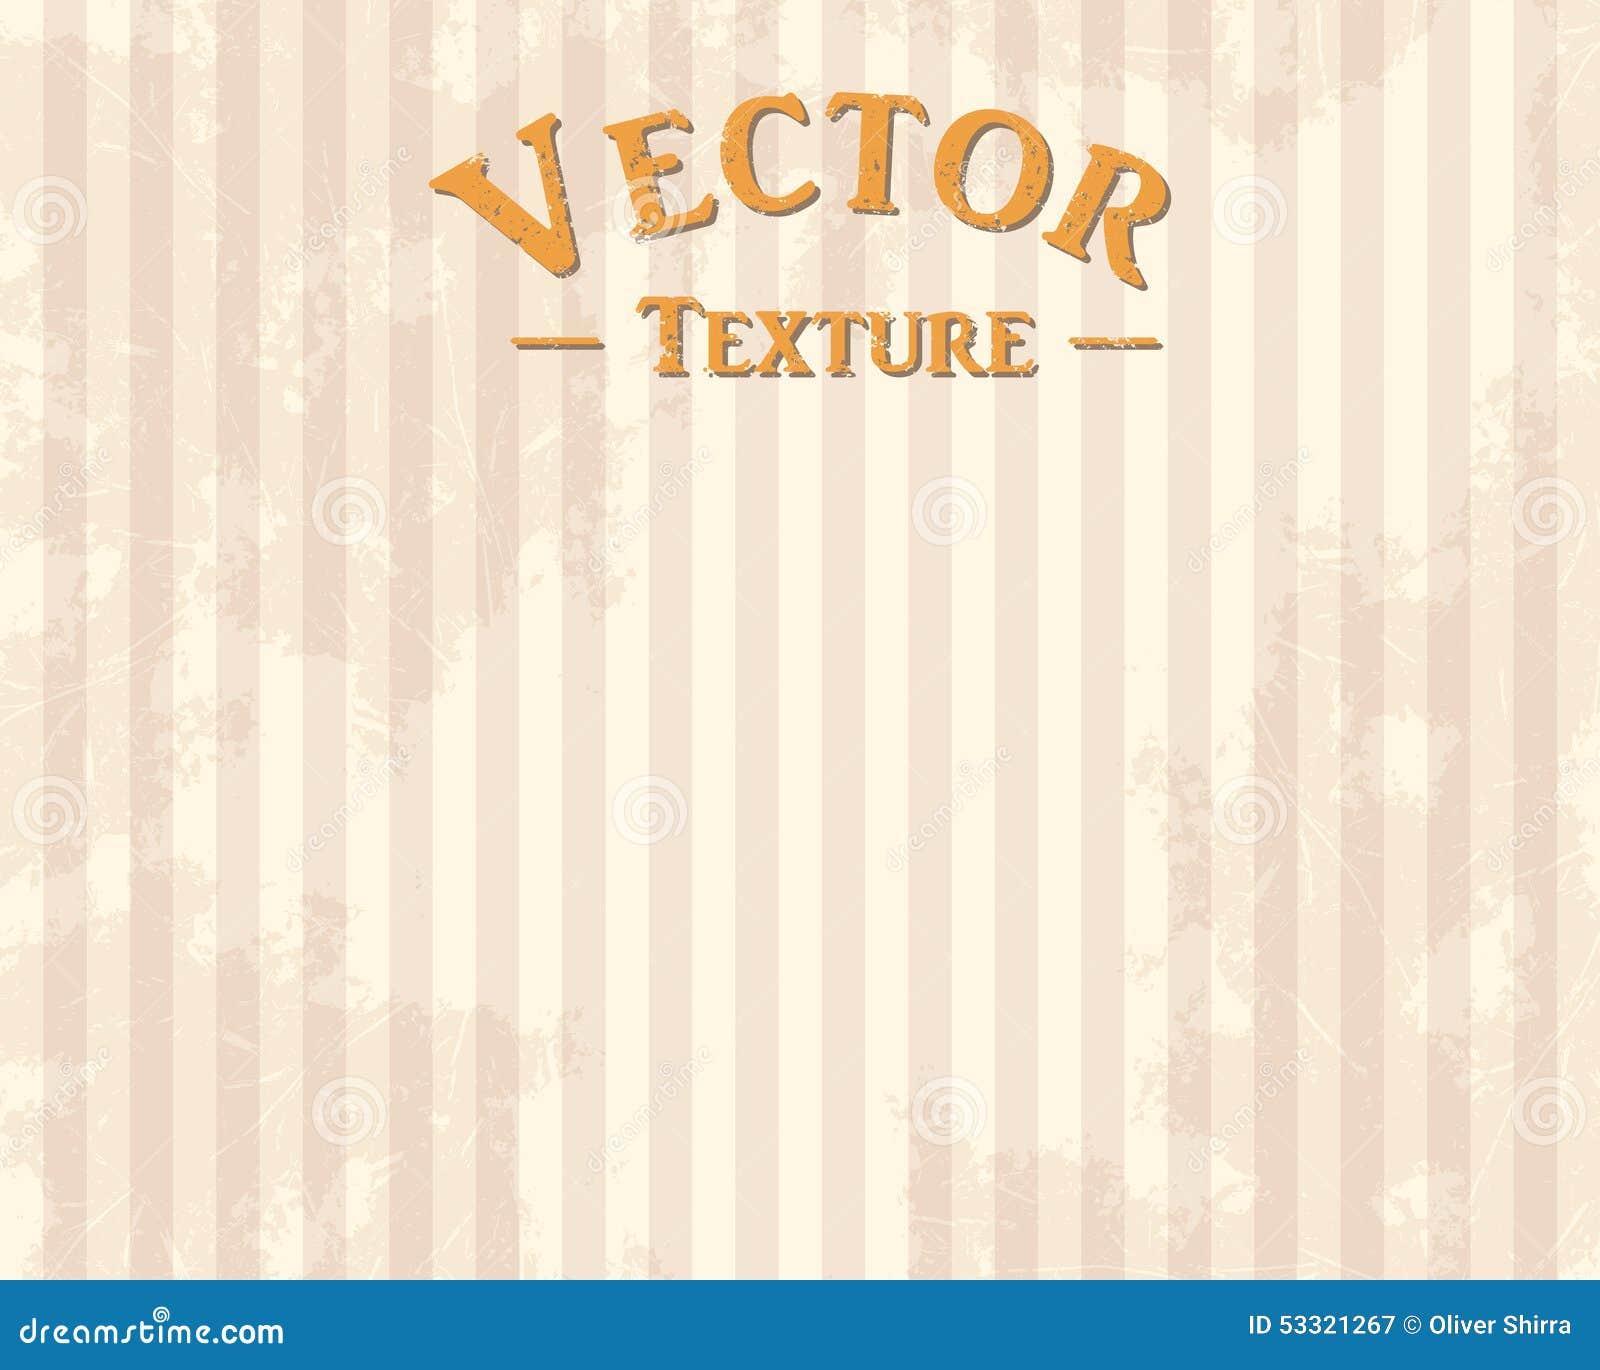 Cream Vintage Grunge Texture Background Vector Made In Illustrator